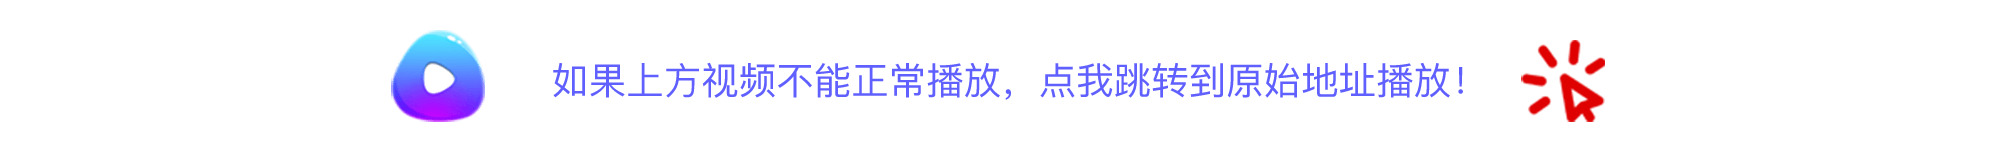 FCPX插件 12组史诗大片电影片尾演职员滚动字幕模板 Cine Credit